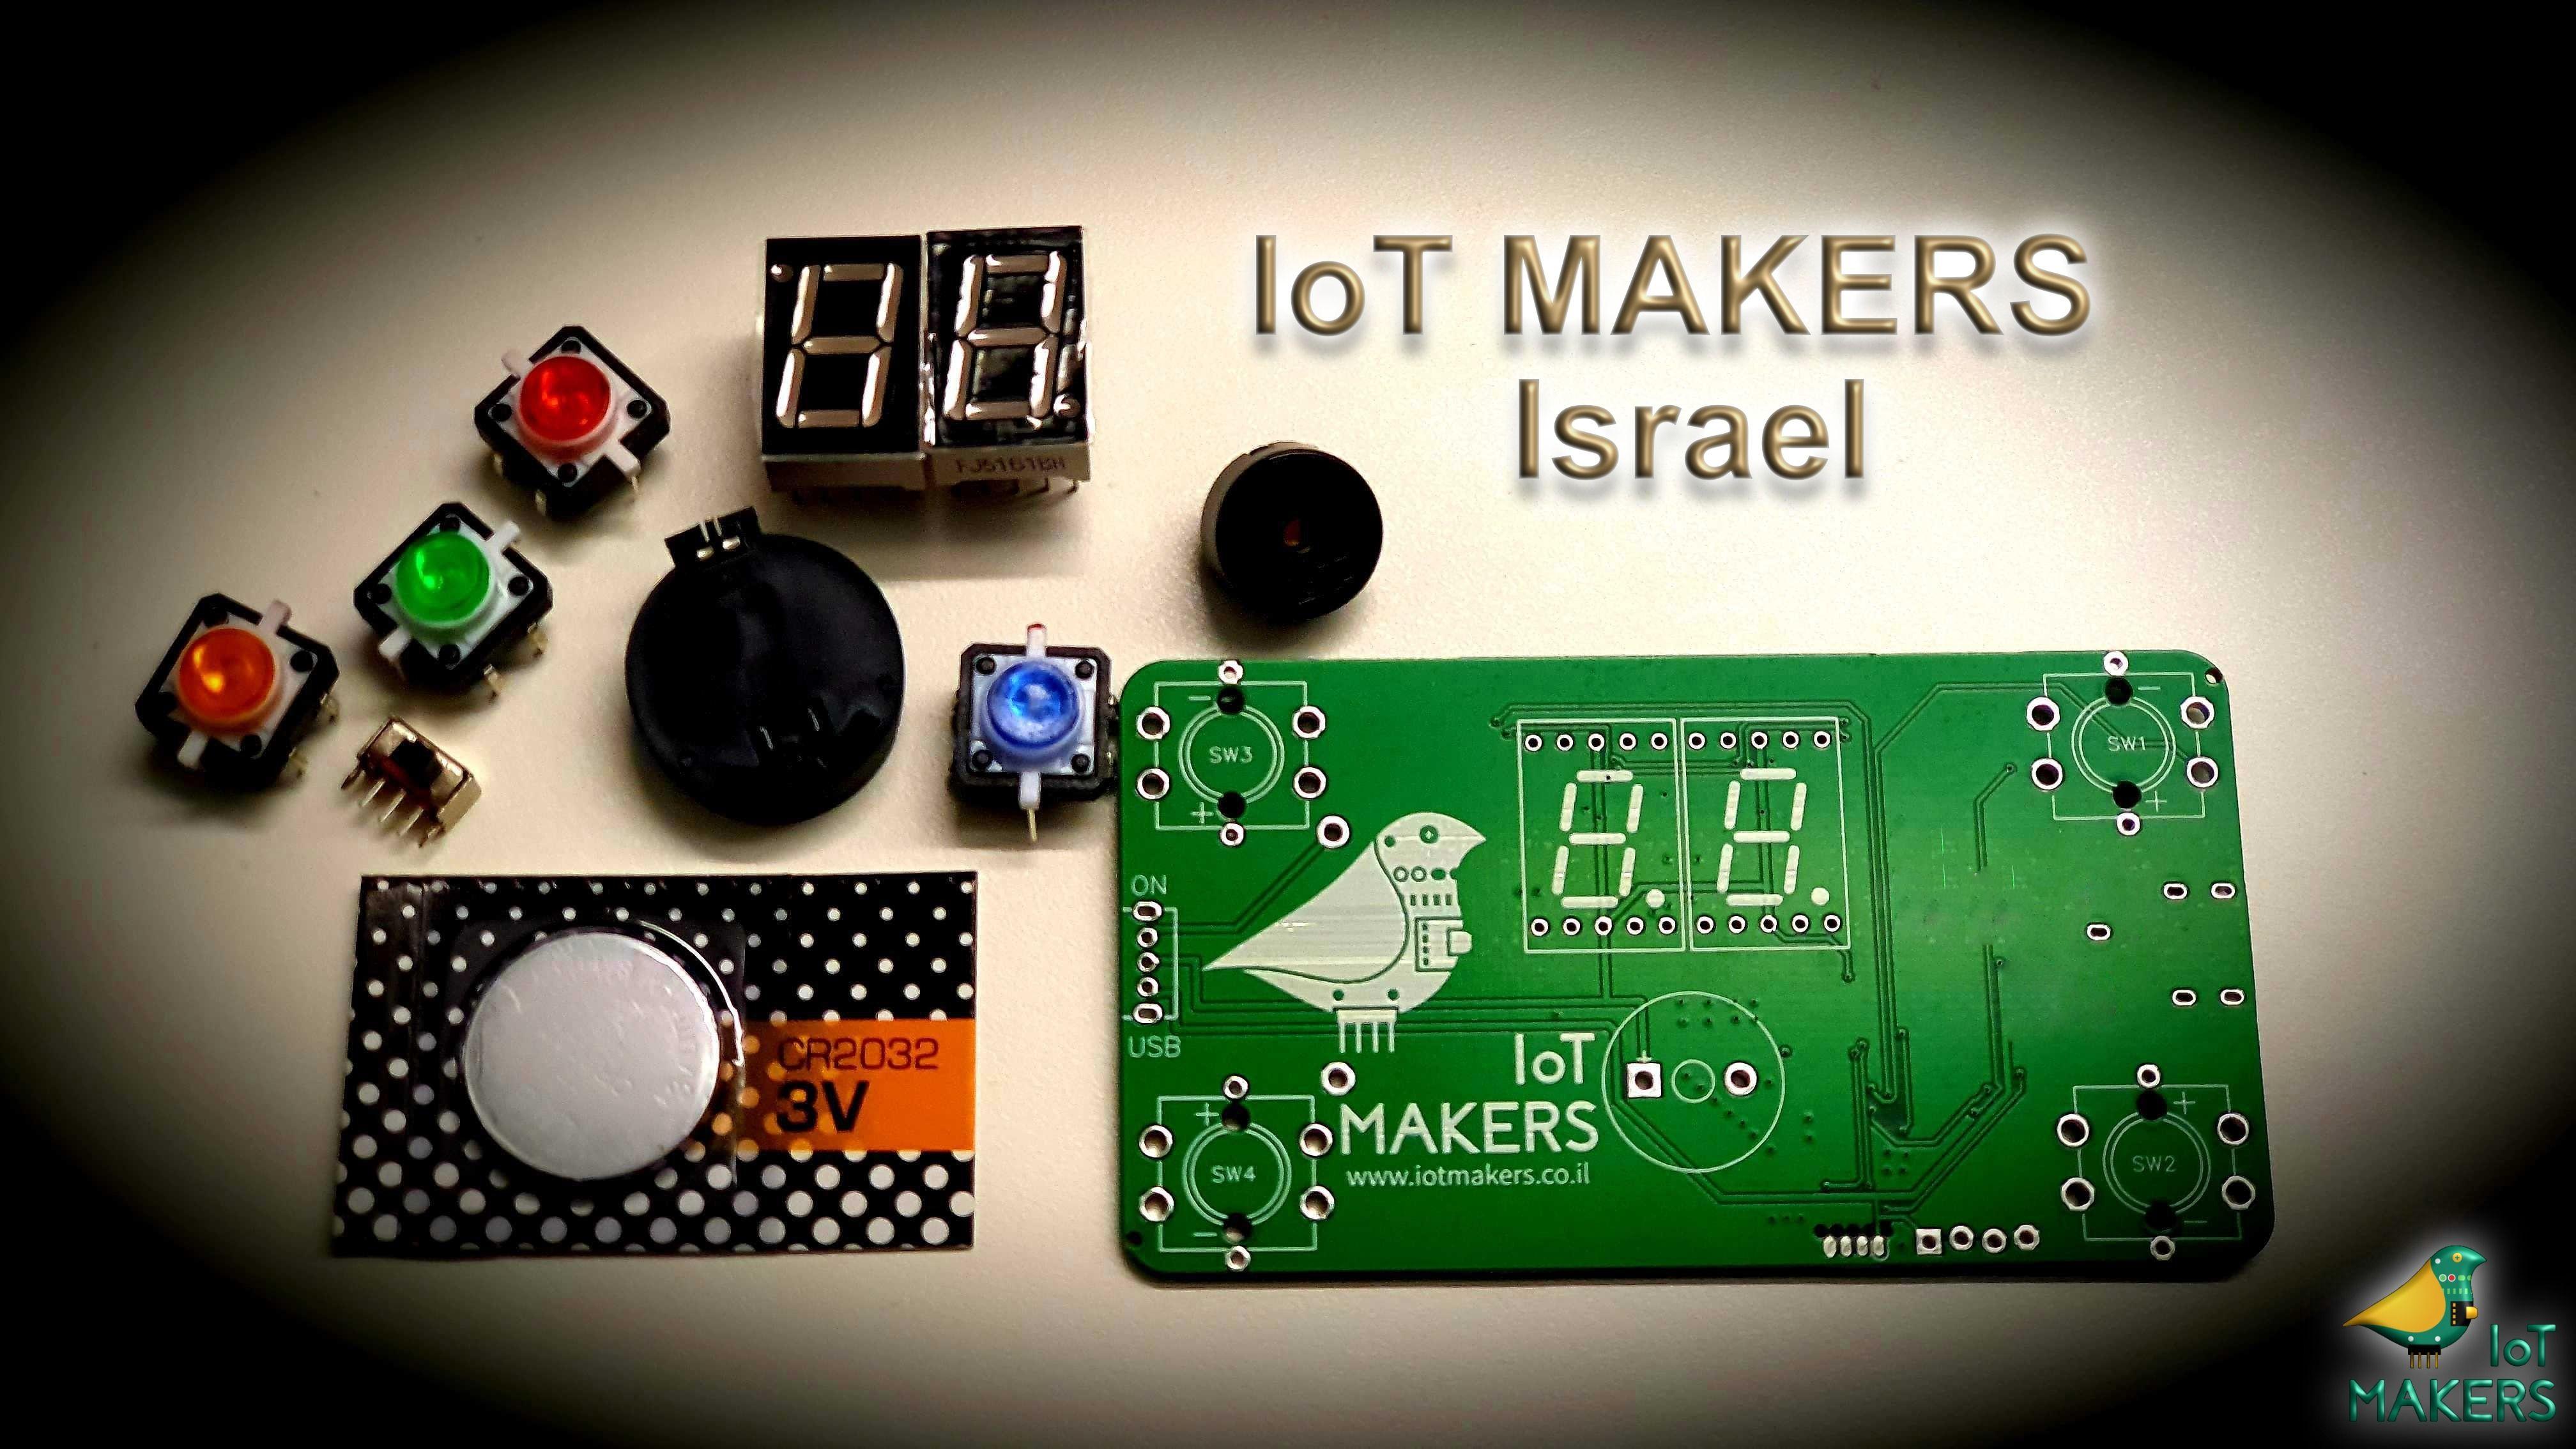 IoT Makers Israel